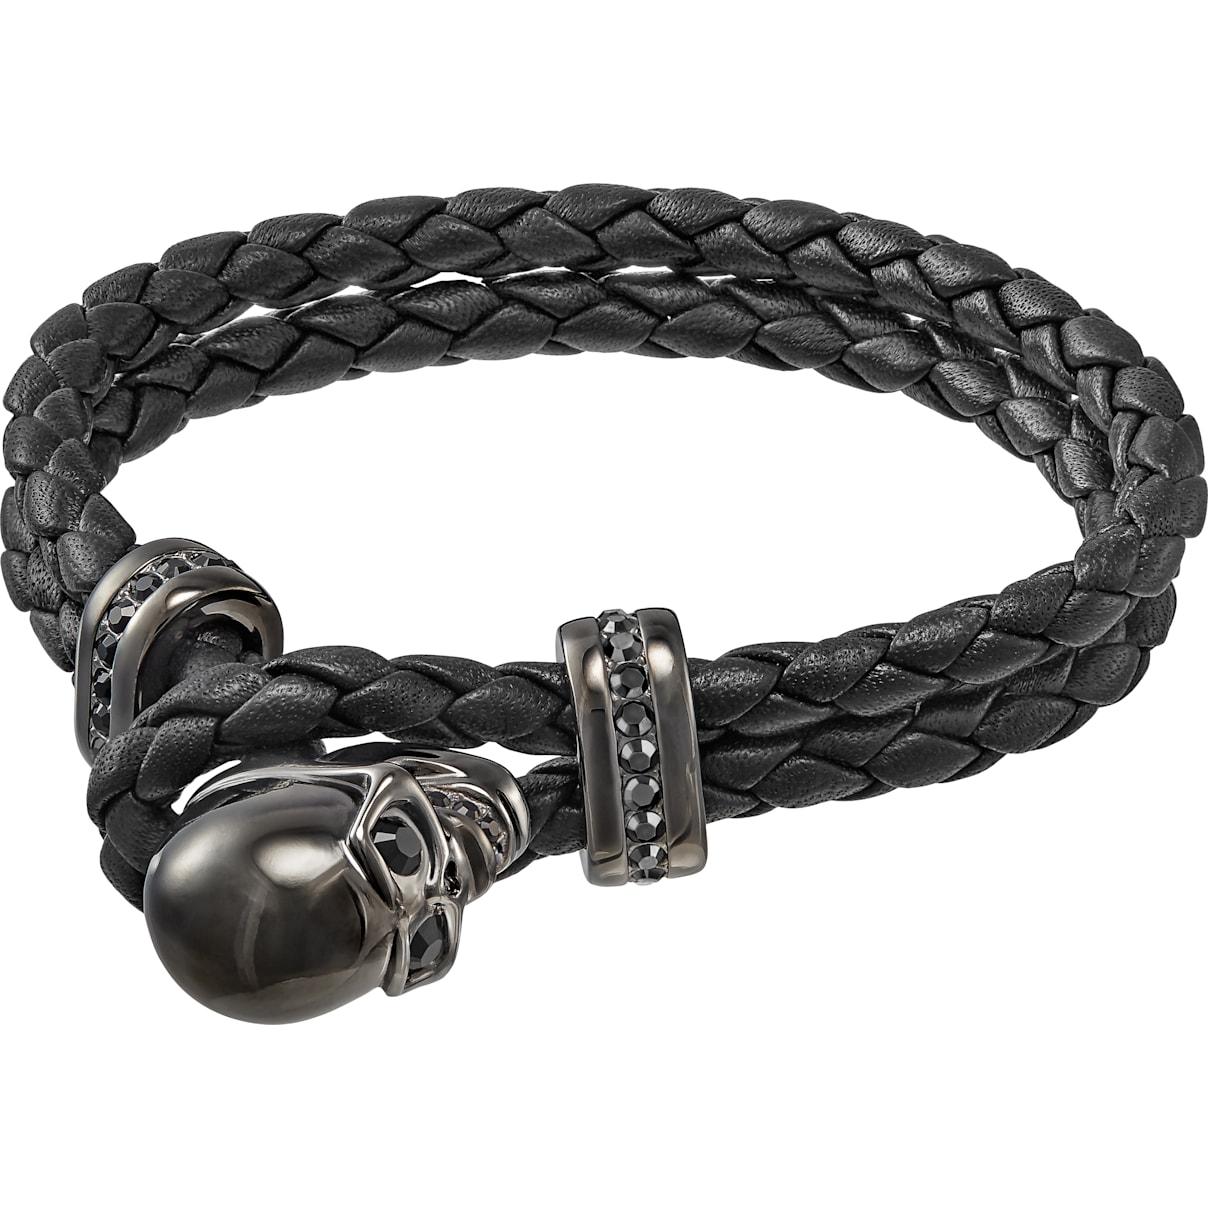 Swarovski Fran Bracelet, Leather, Black, Gun Metal plated